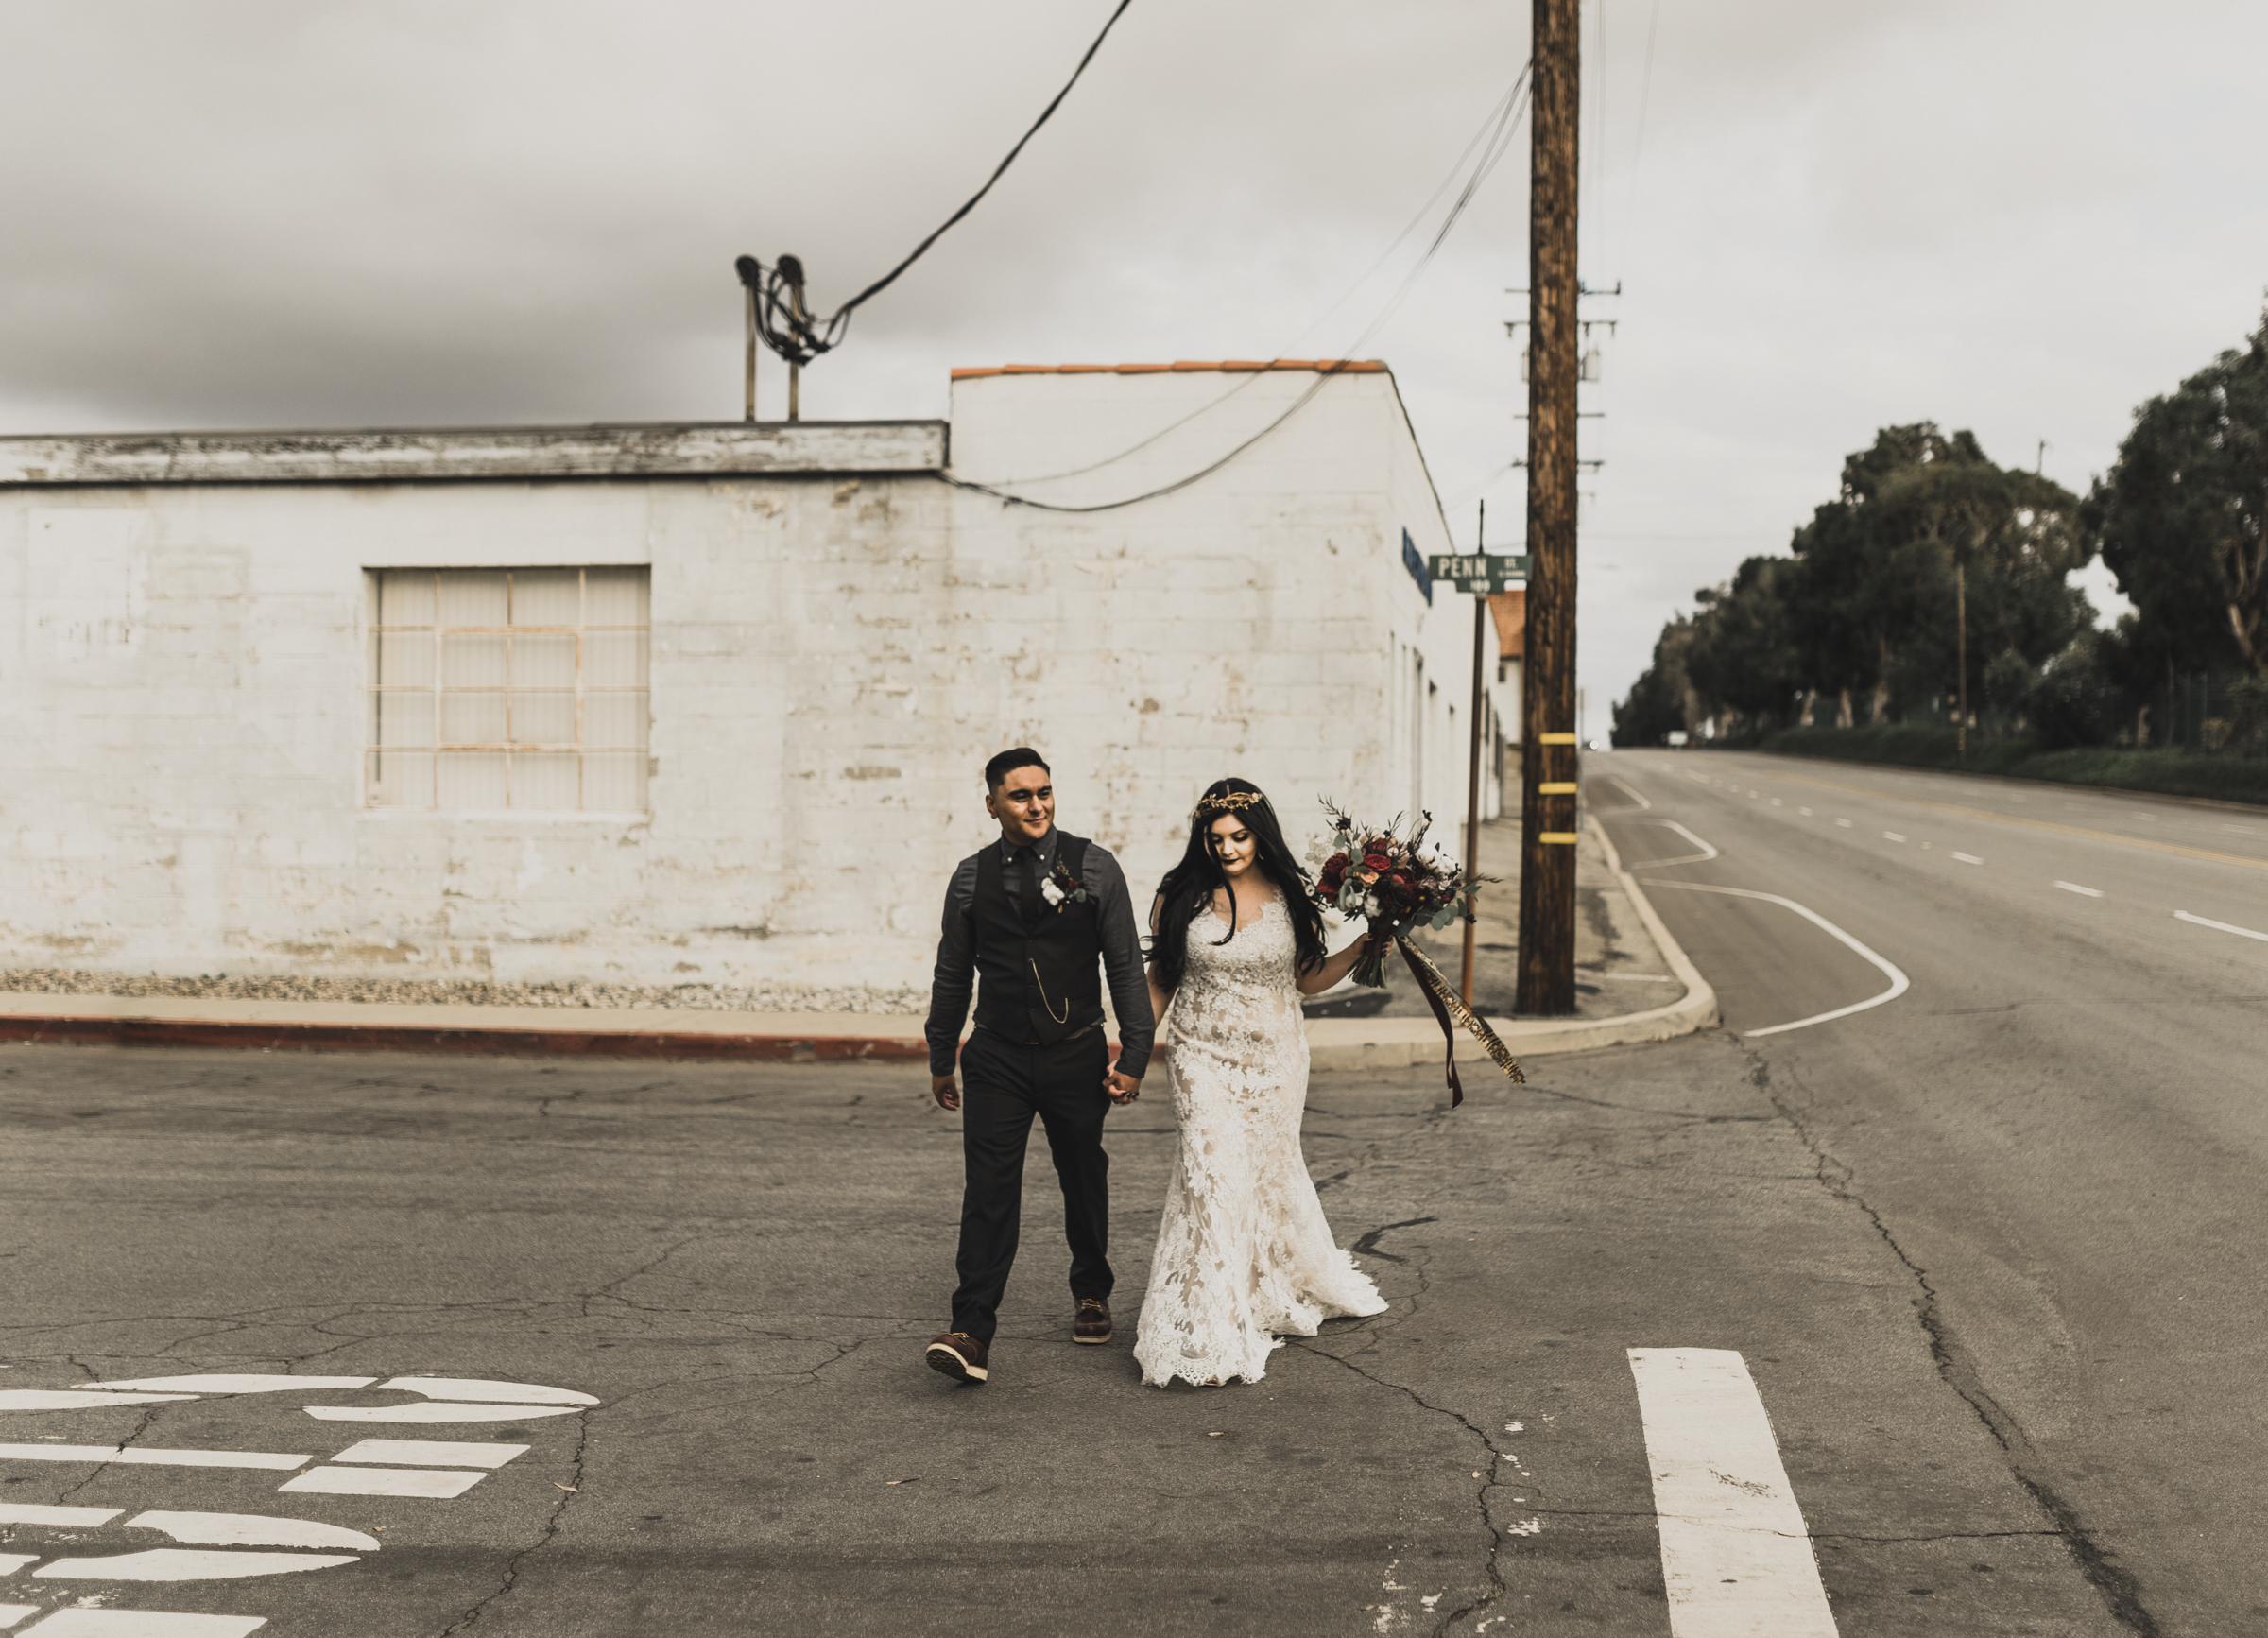 ©Isaiah + Taylor Photography - Smoky Hollow Studios Wedding, El Segundo, Los Angeles Wedding Photographer-94.jpg